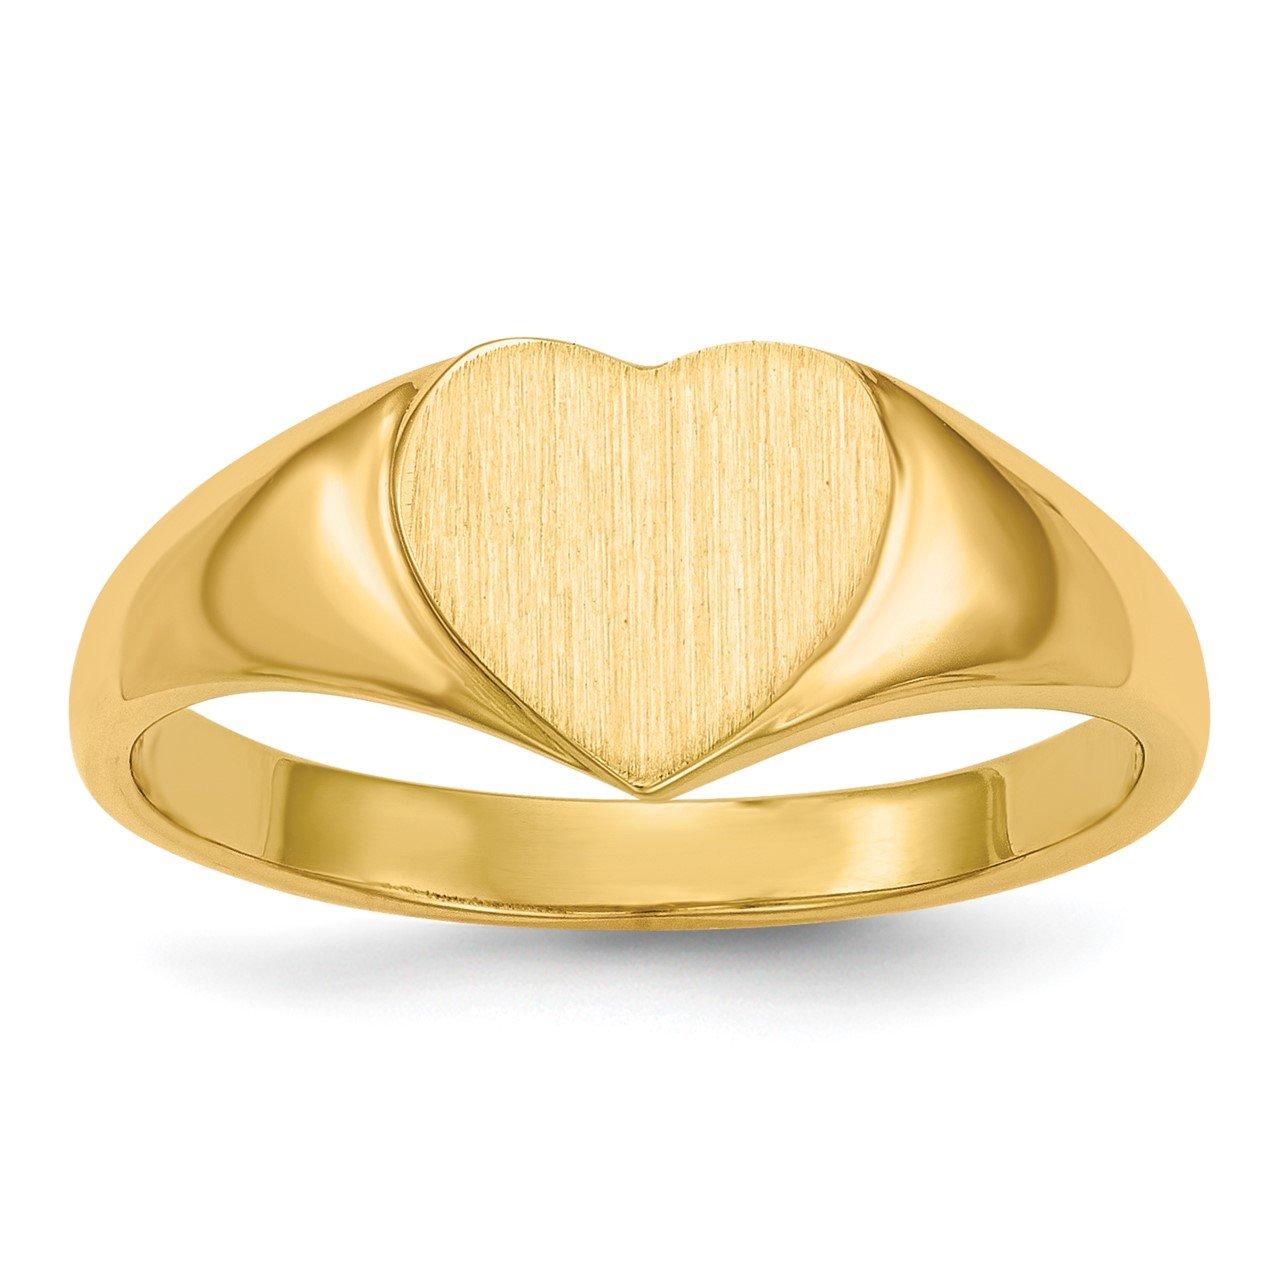 14k 7.5x8.5mm Open Back Heart Signet Ring